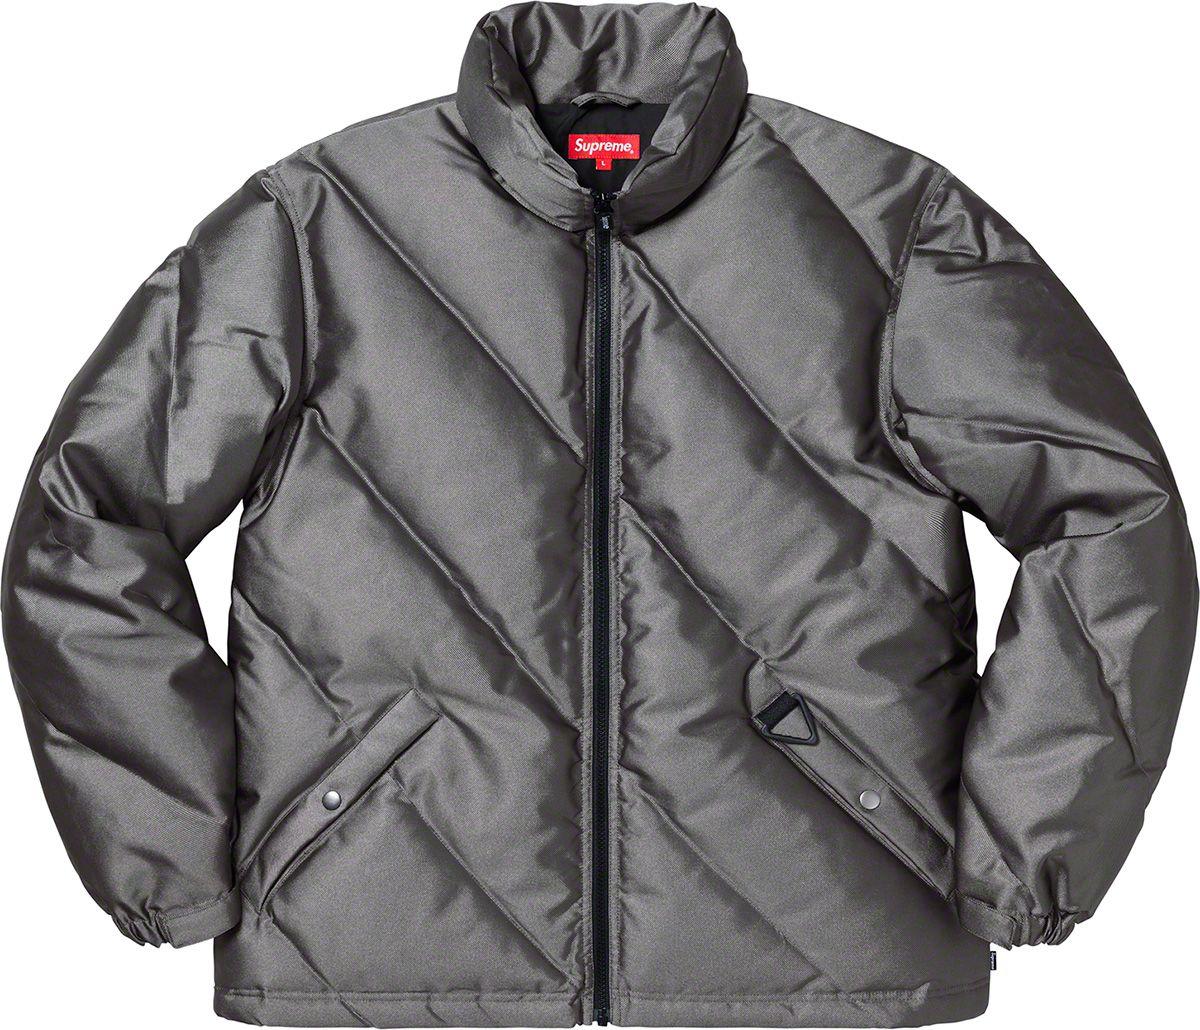 Supreme Iridescent Puffy Jacket Jackets Puffy Jacket Fashion Design [ 1030 x 1200 Pixel ]